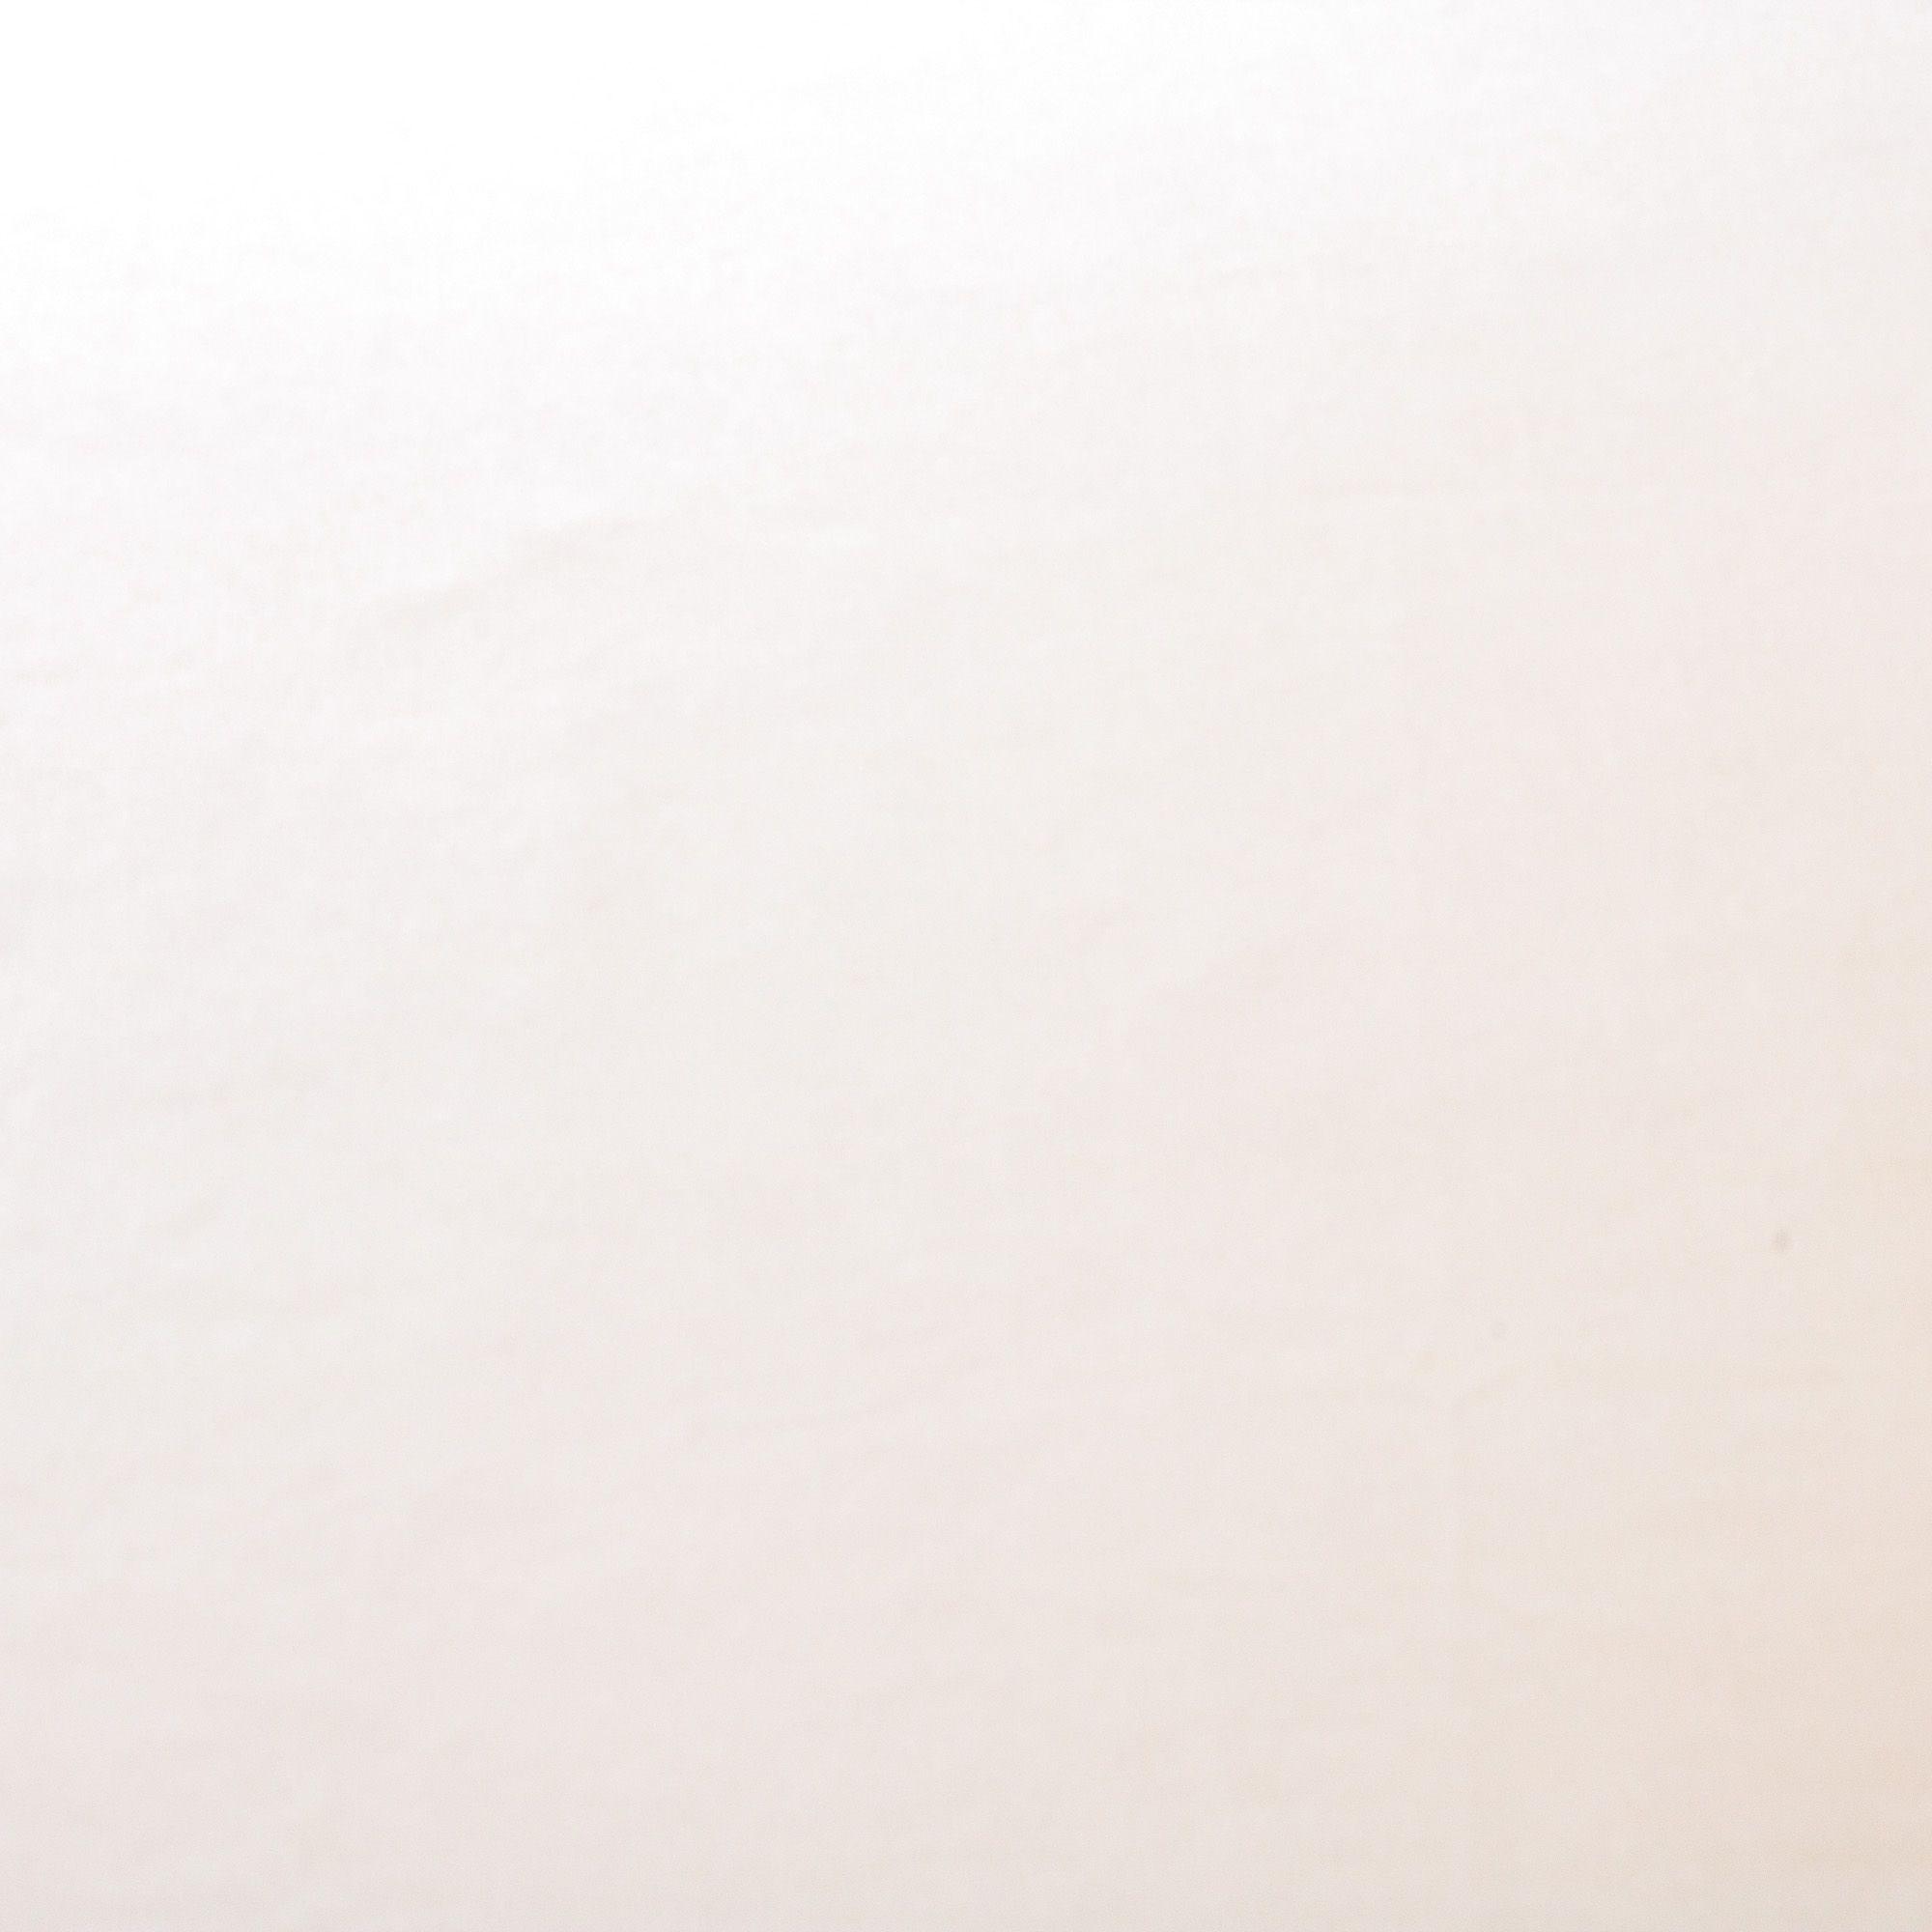 Tecido Malha Helanca Light Branca 100% Poliester 1,80 mt Largura